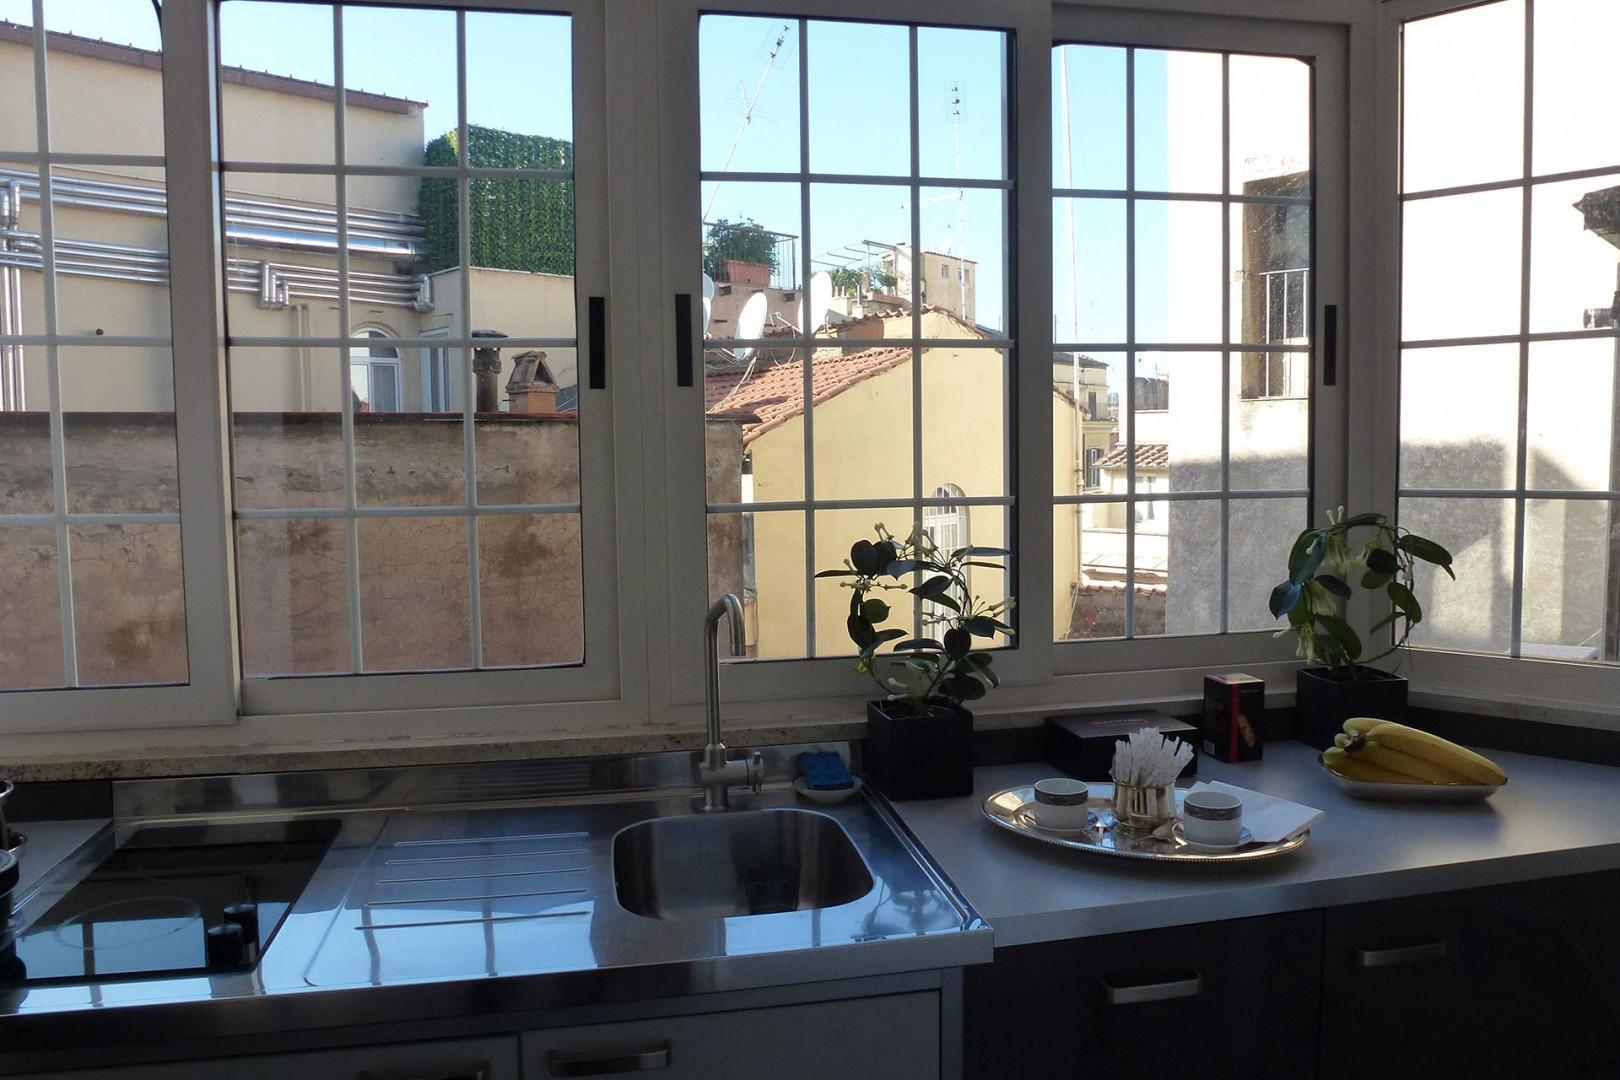 Bright kitchen has nice views too.